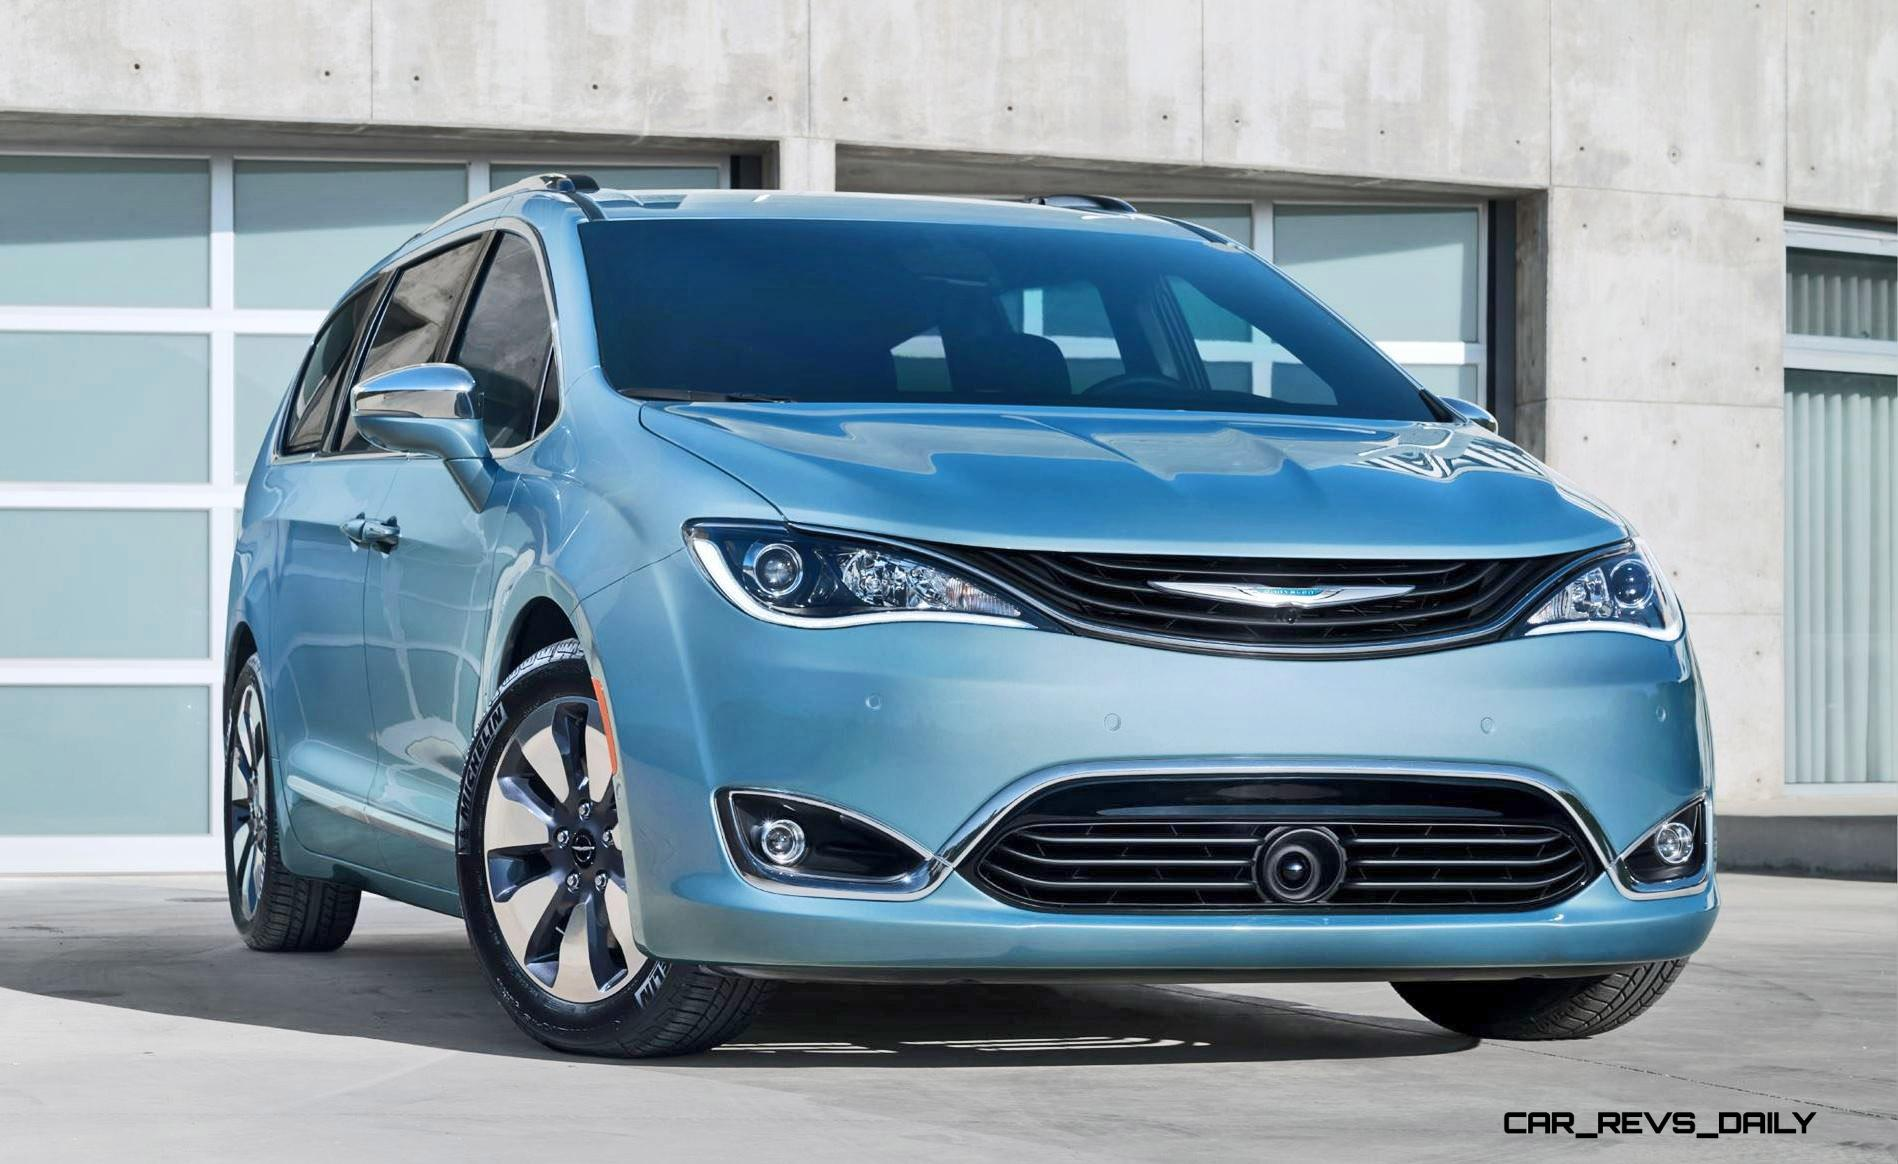 2017 Chrysler PACIFICA Is All-New Minivan